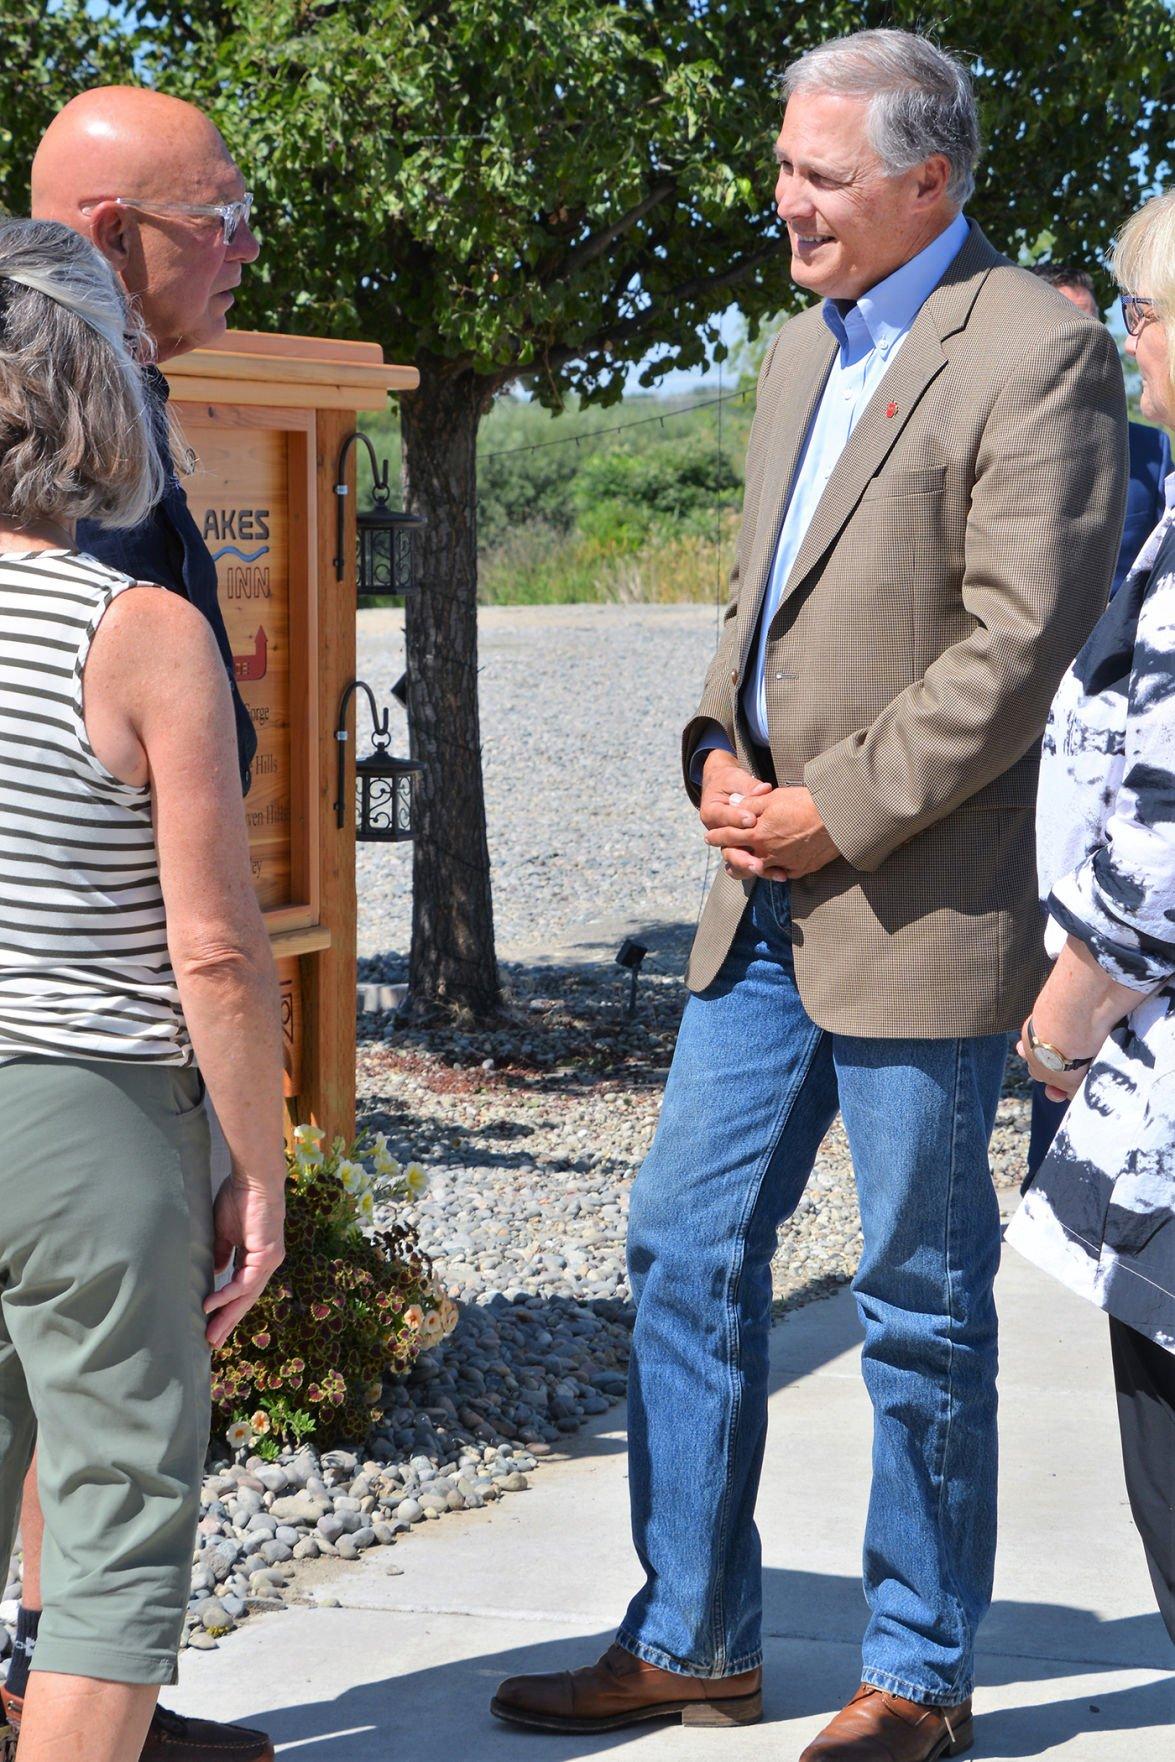 Governor visits Zillah inn